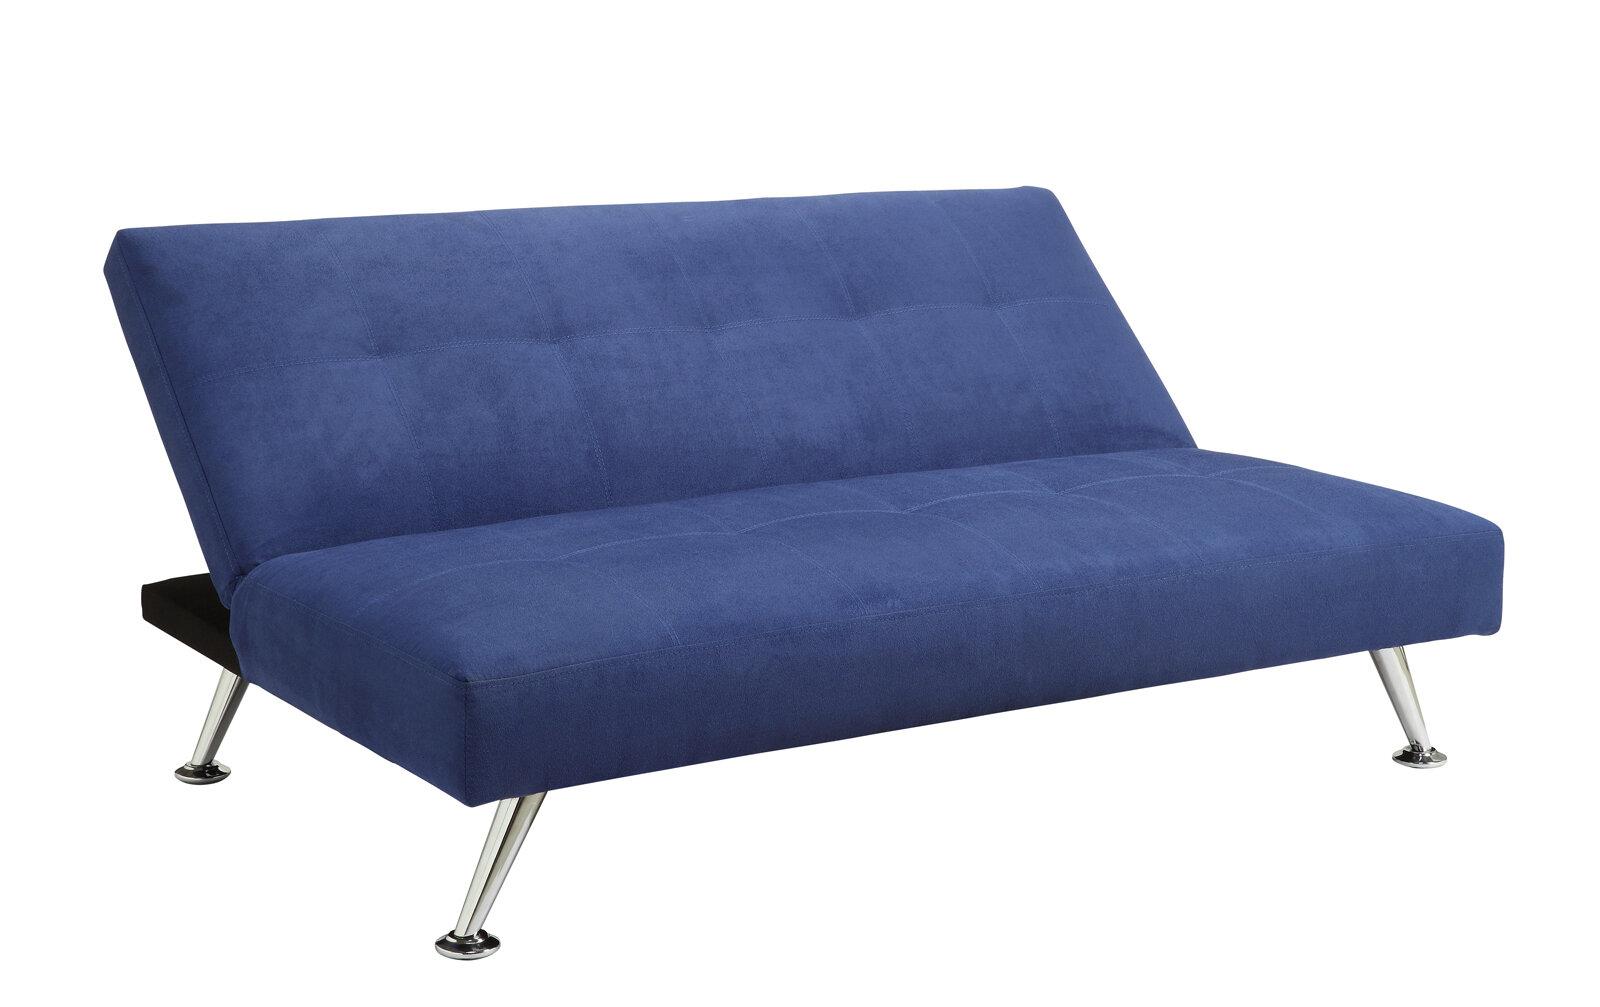 convertible junior futon lounger fold down mini guest bed. Black Bedroom Furniture Sets. Home Design Ideas